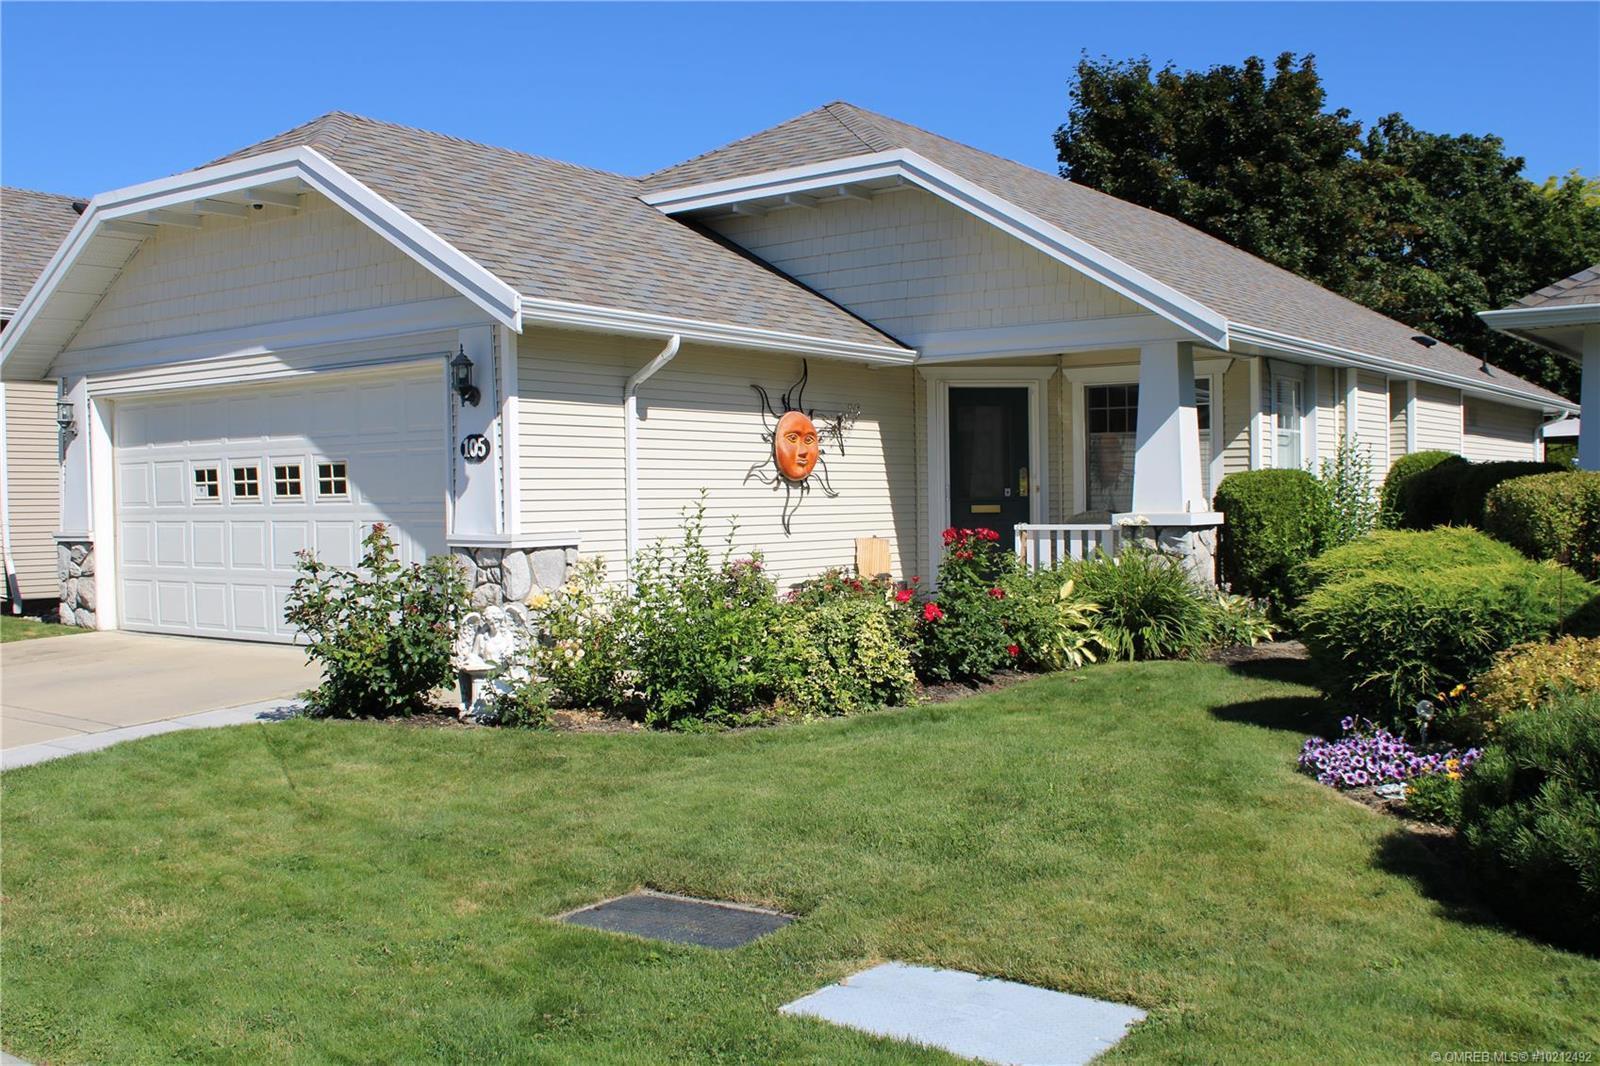 Removed: 1330 Ridgeway Drive, Kelowna, BC - Removed on 2020-09-10 23:22:18